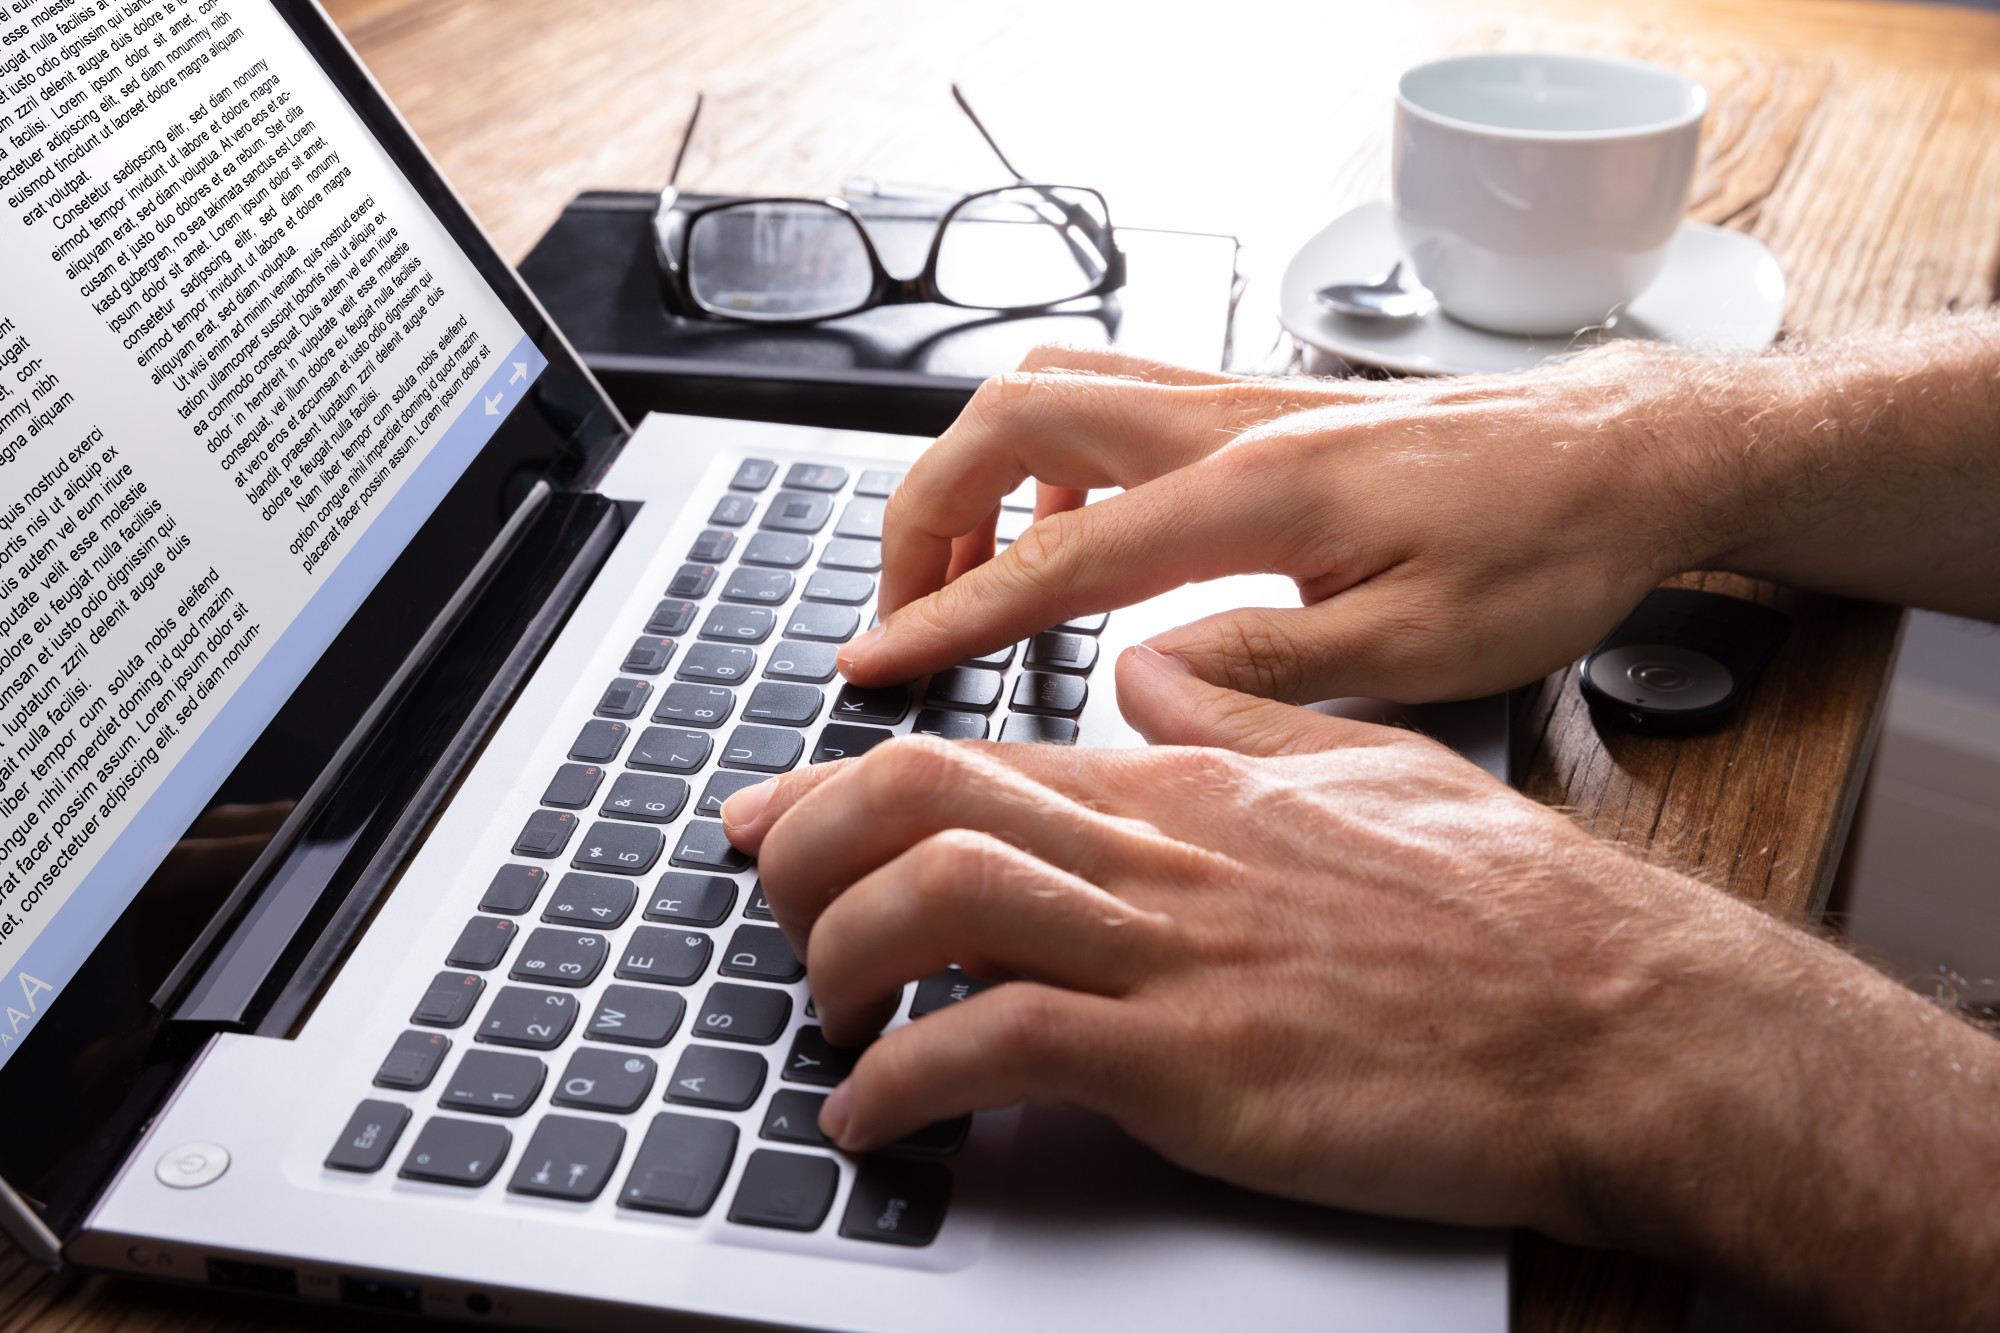 5 Freelance Writing Tips For Beginners